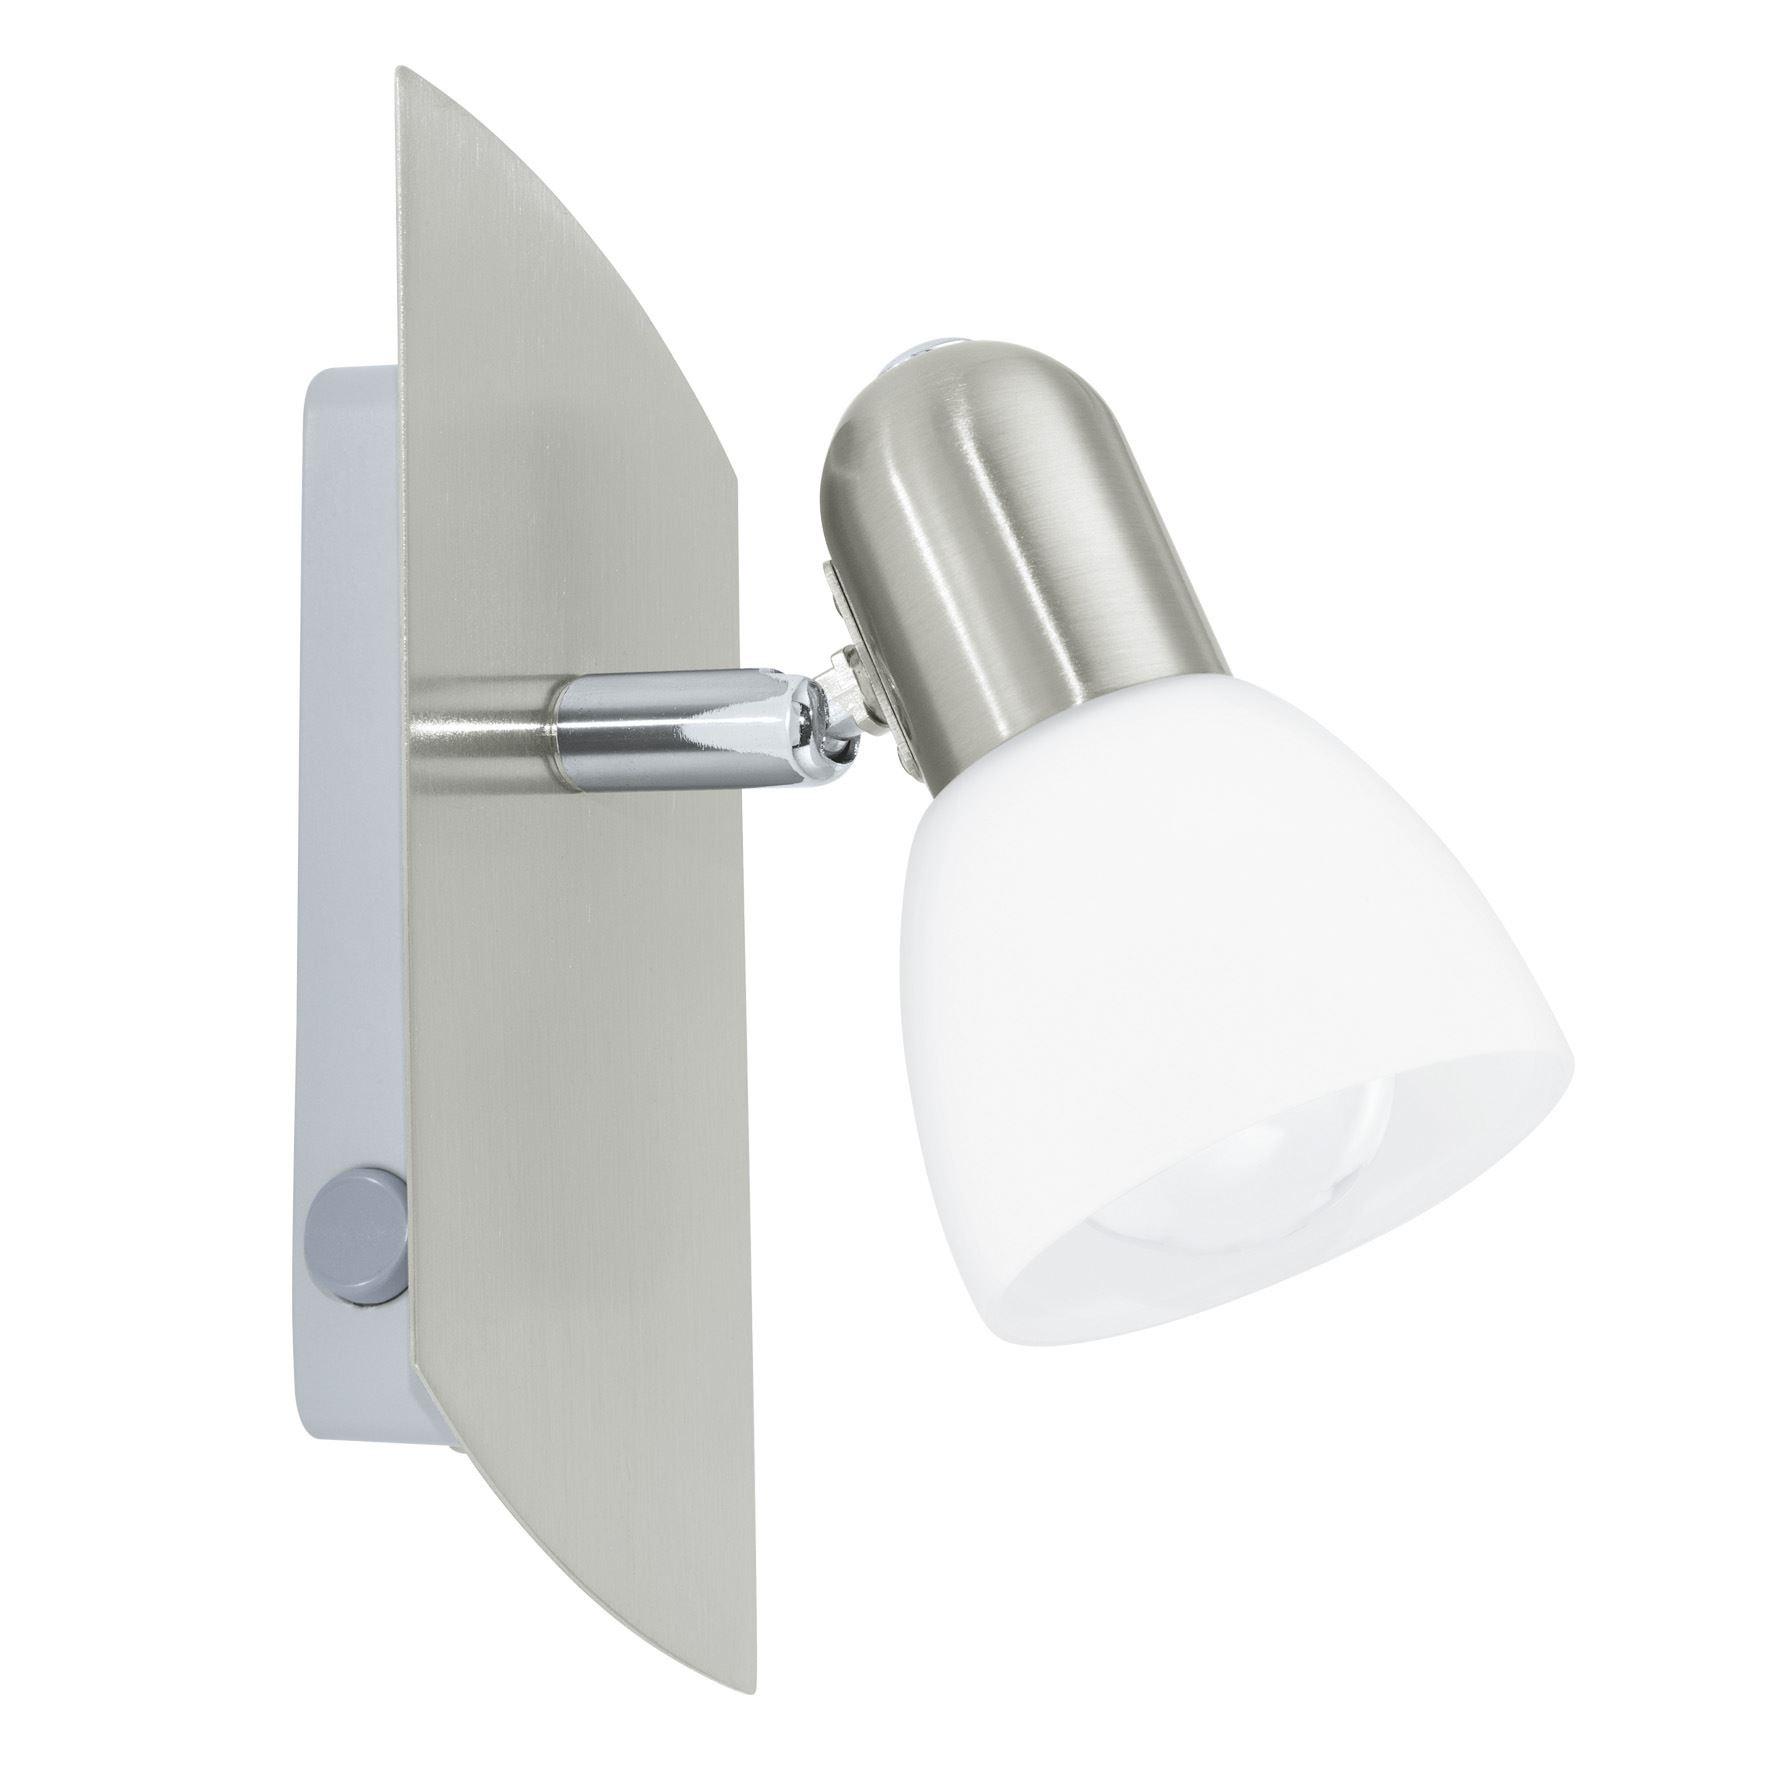 Enea Wall Spot Light E14 Glass White Shade Rocker Switch